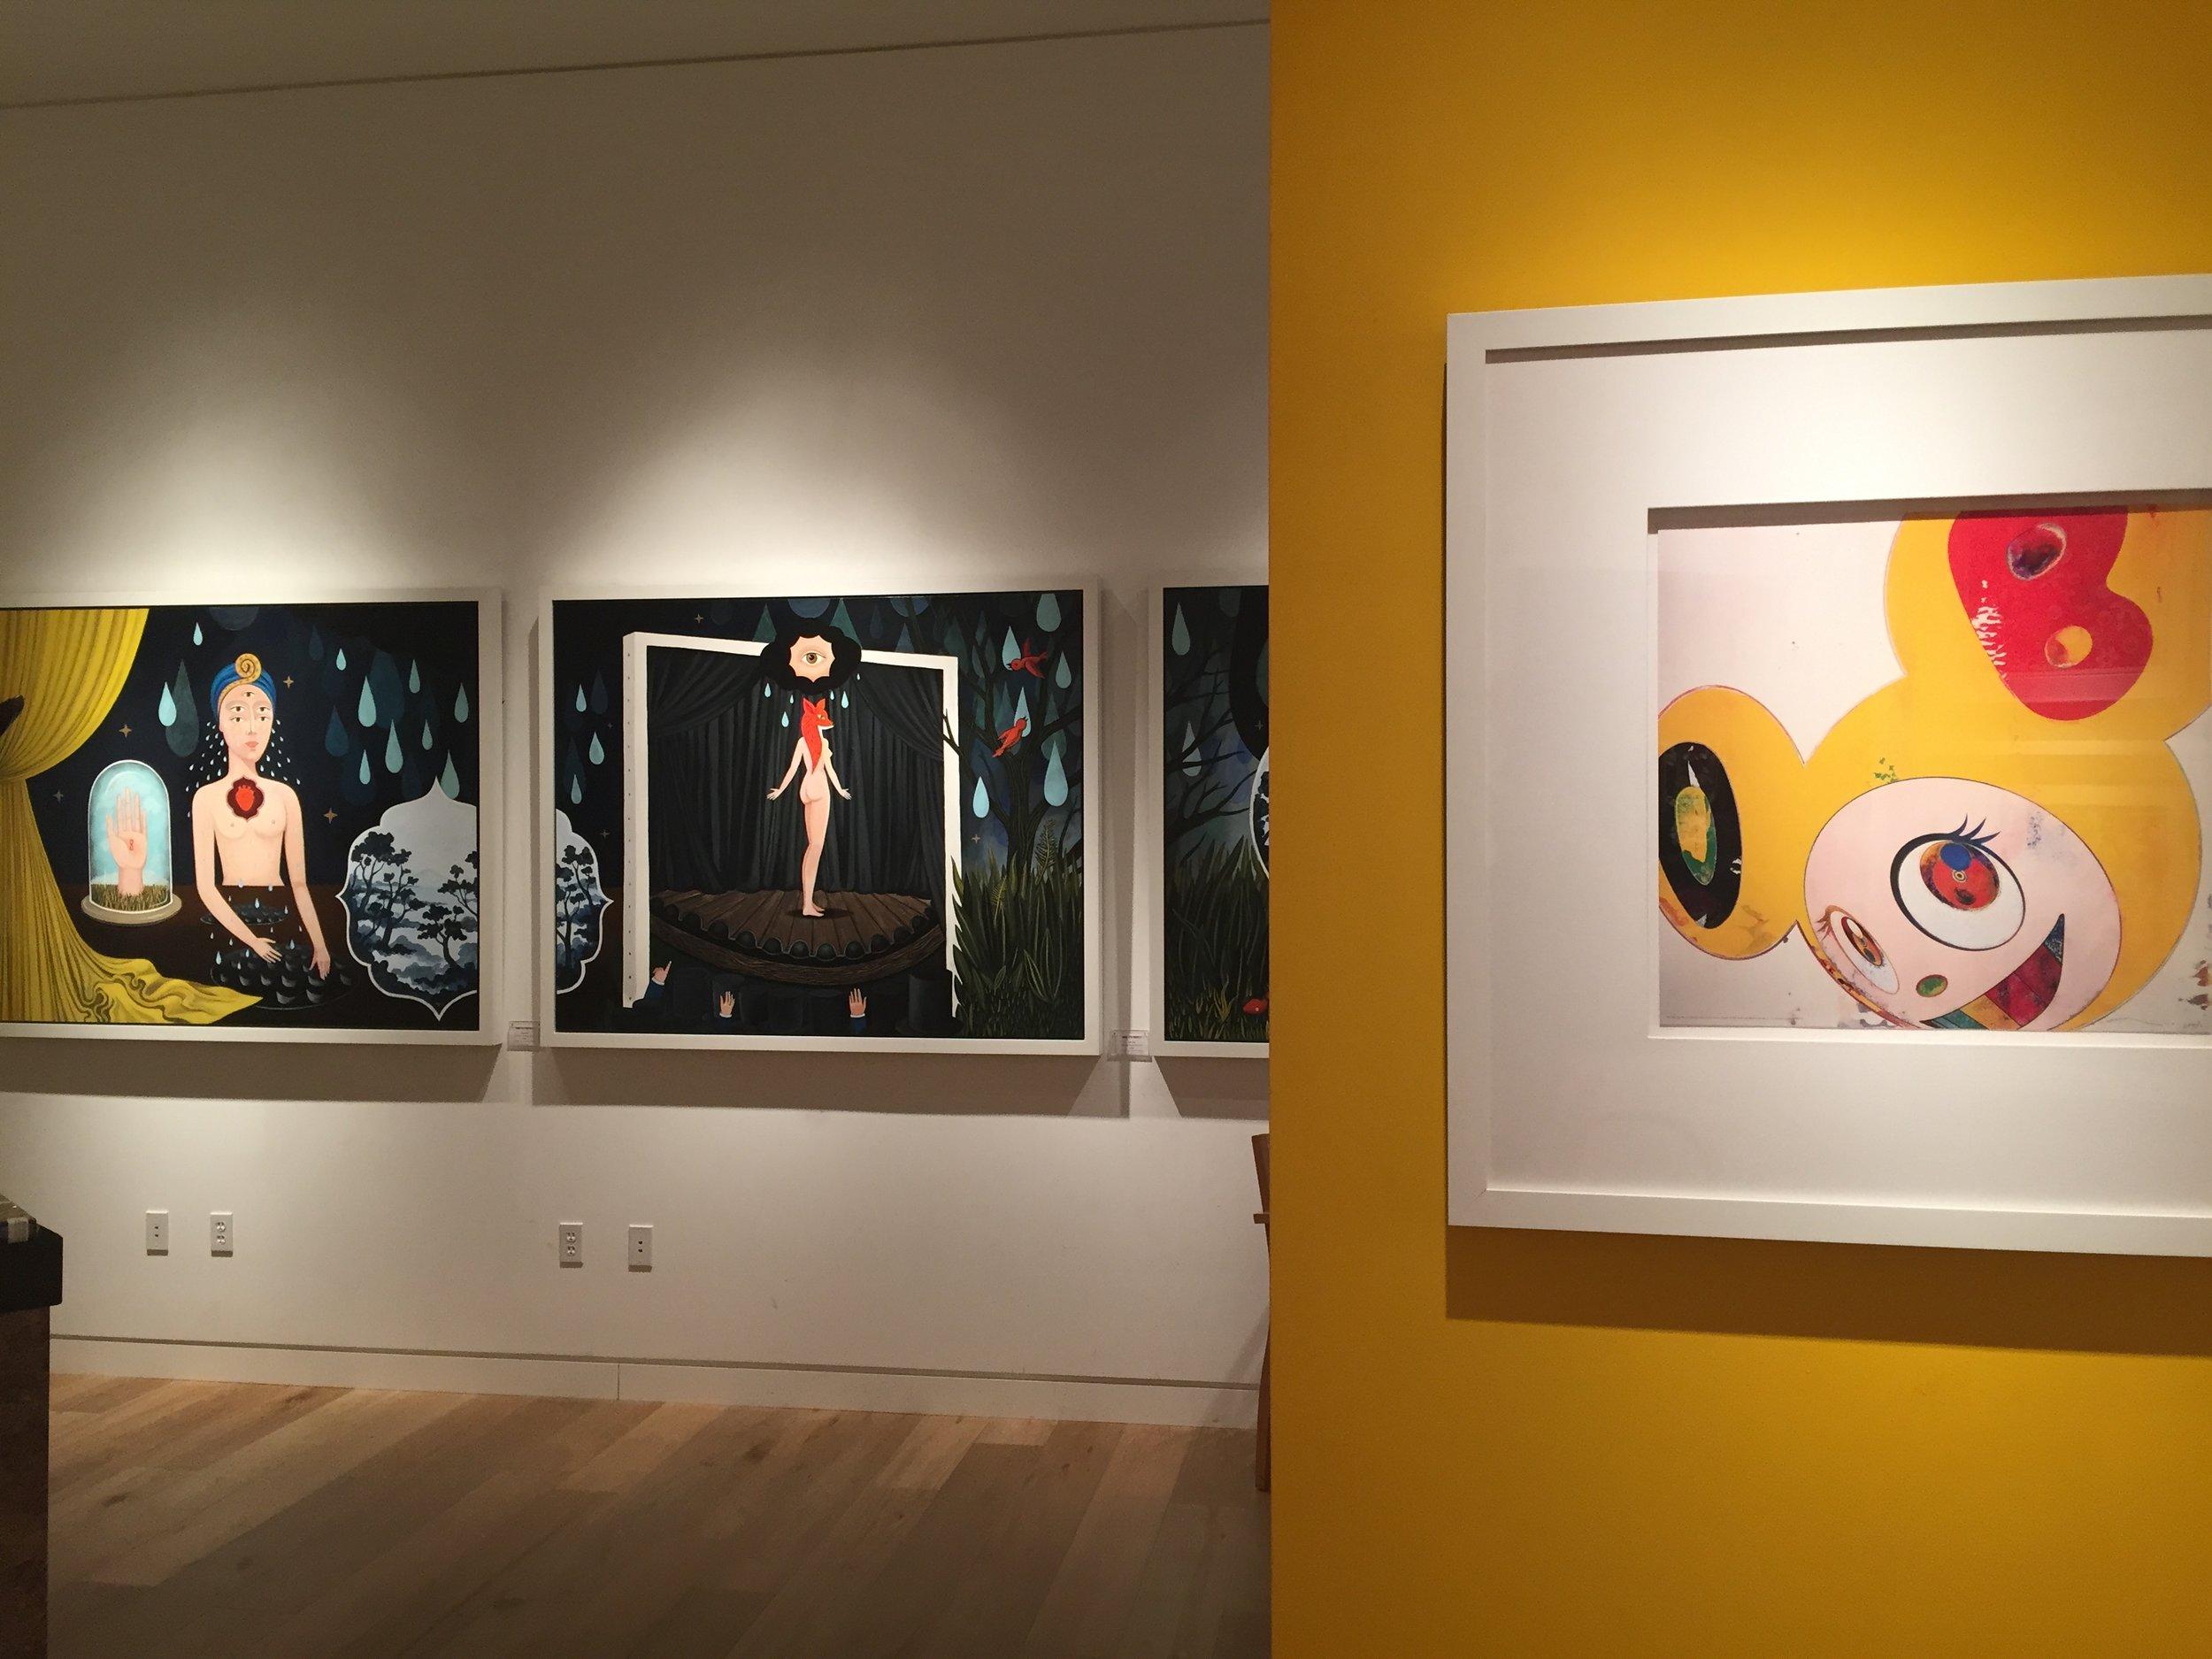 Art by Anne Faith Nicholls and Takashi Murakami at Martin Lawrence Galleries, South Coast Plaza, CA.